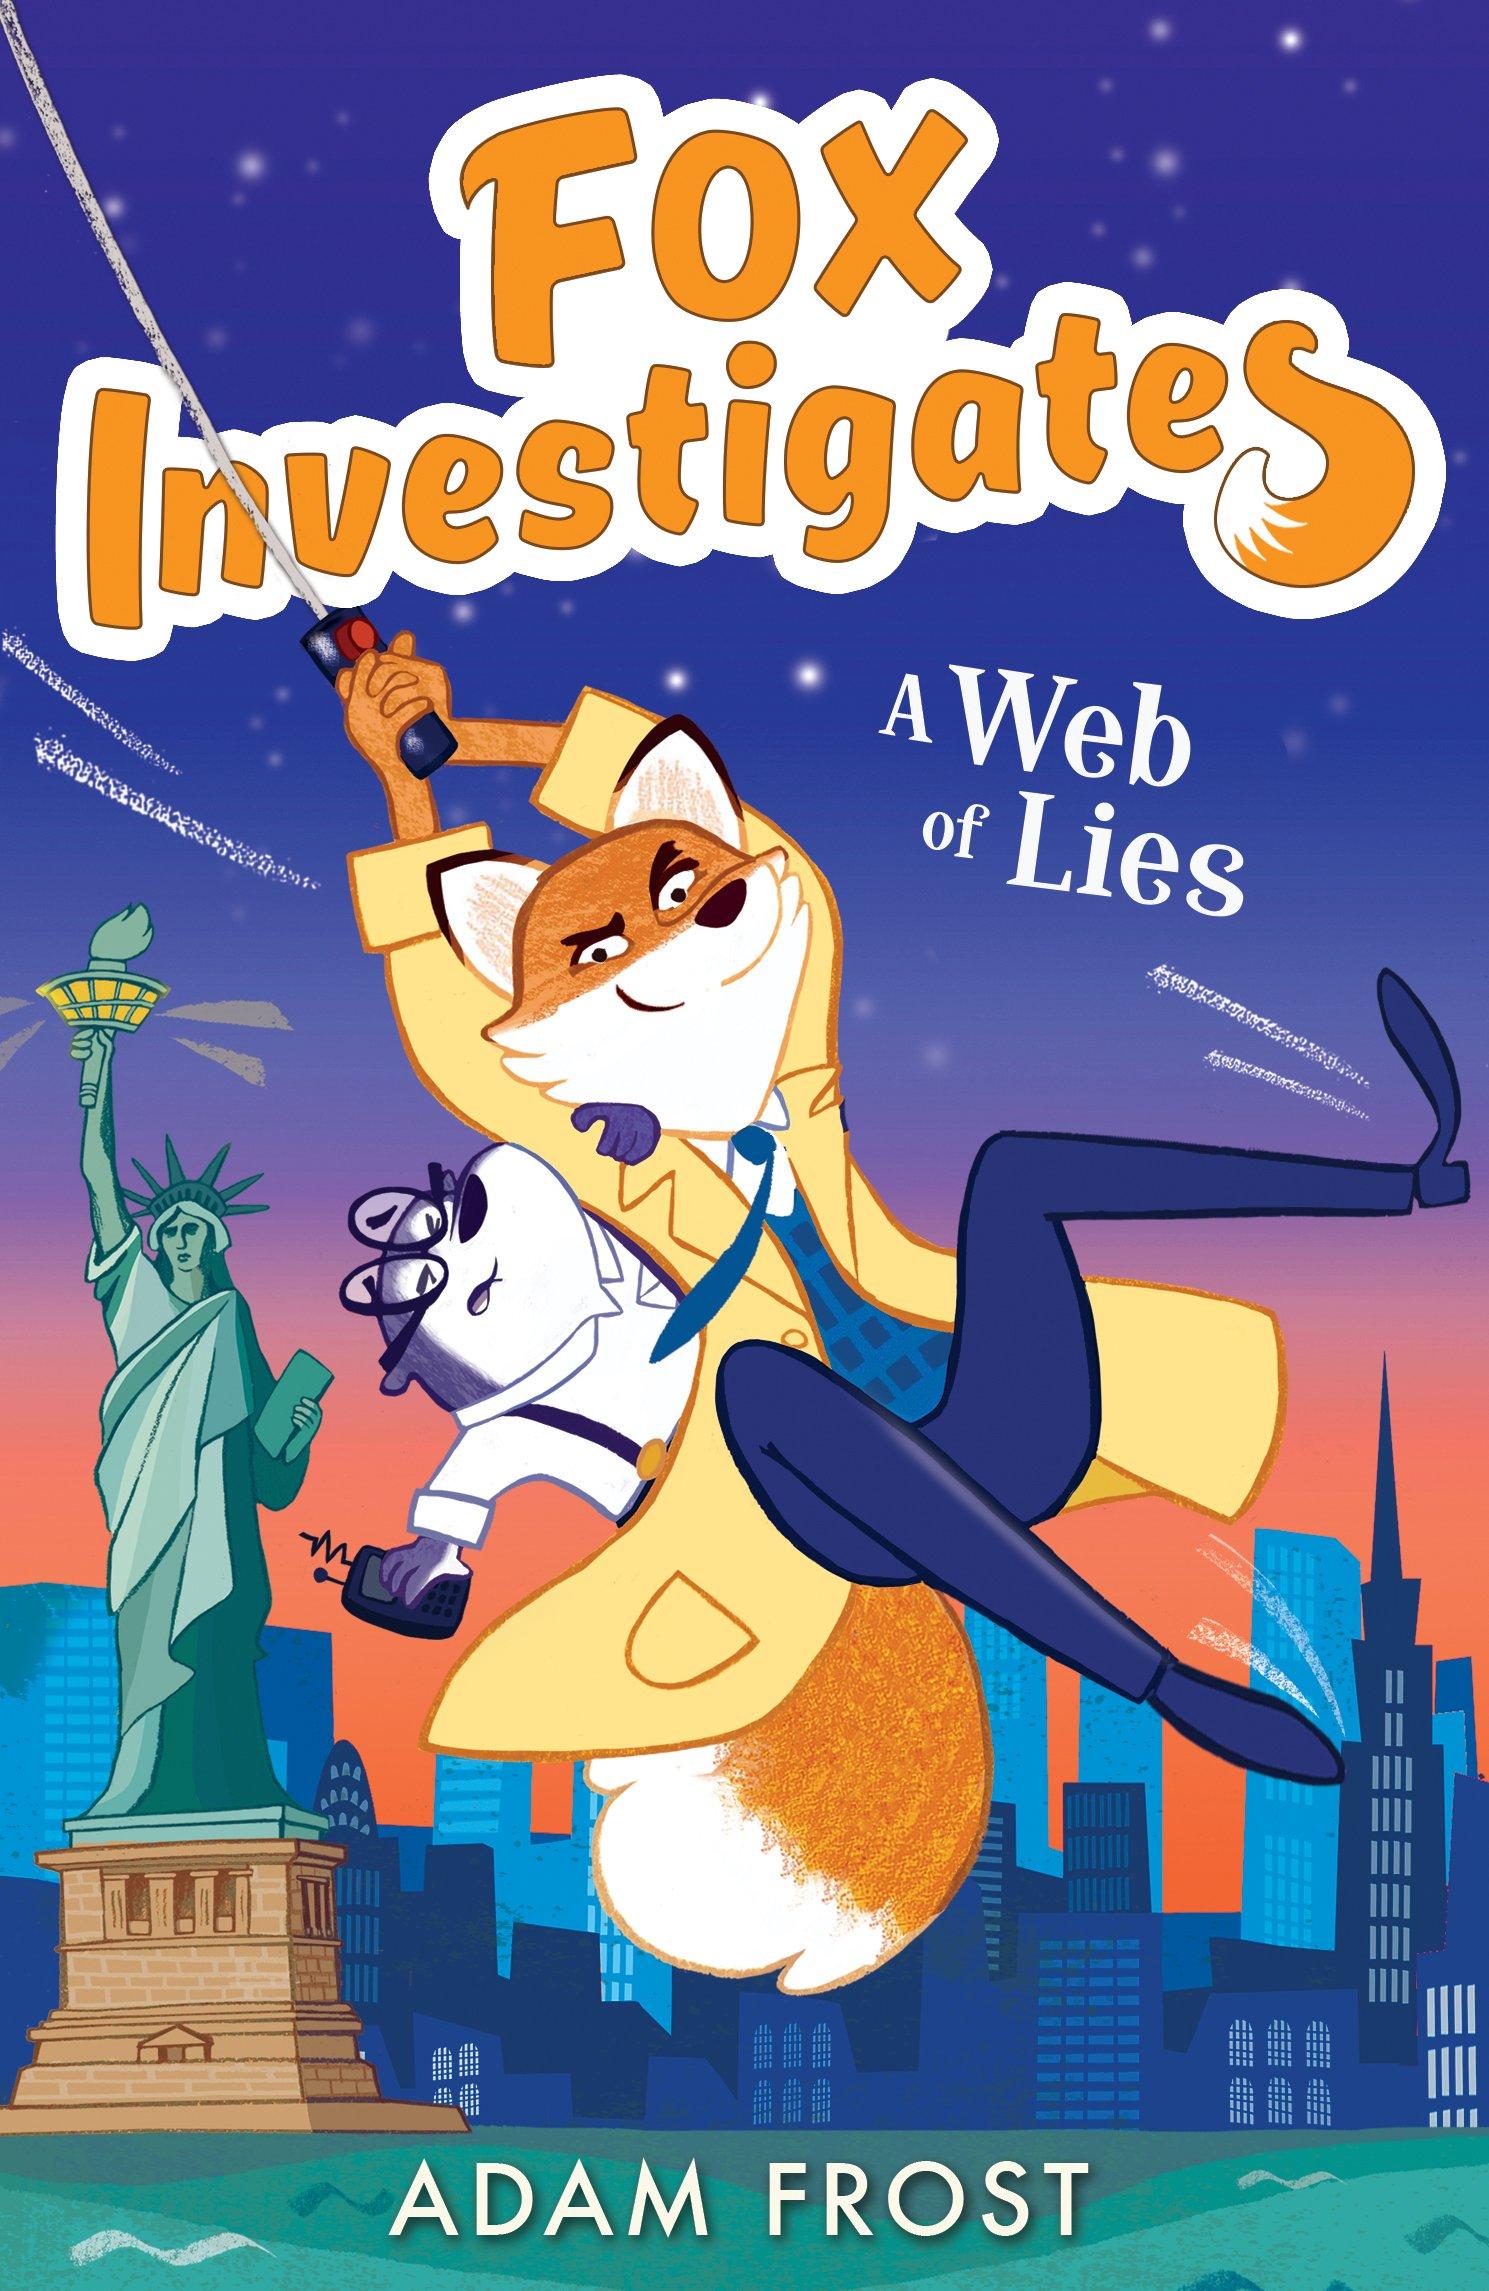 Read Online A Web of Lies (Fox Investigates) ebook